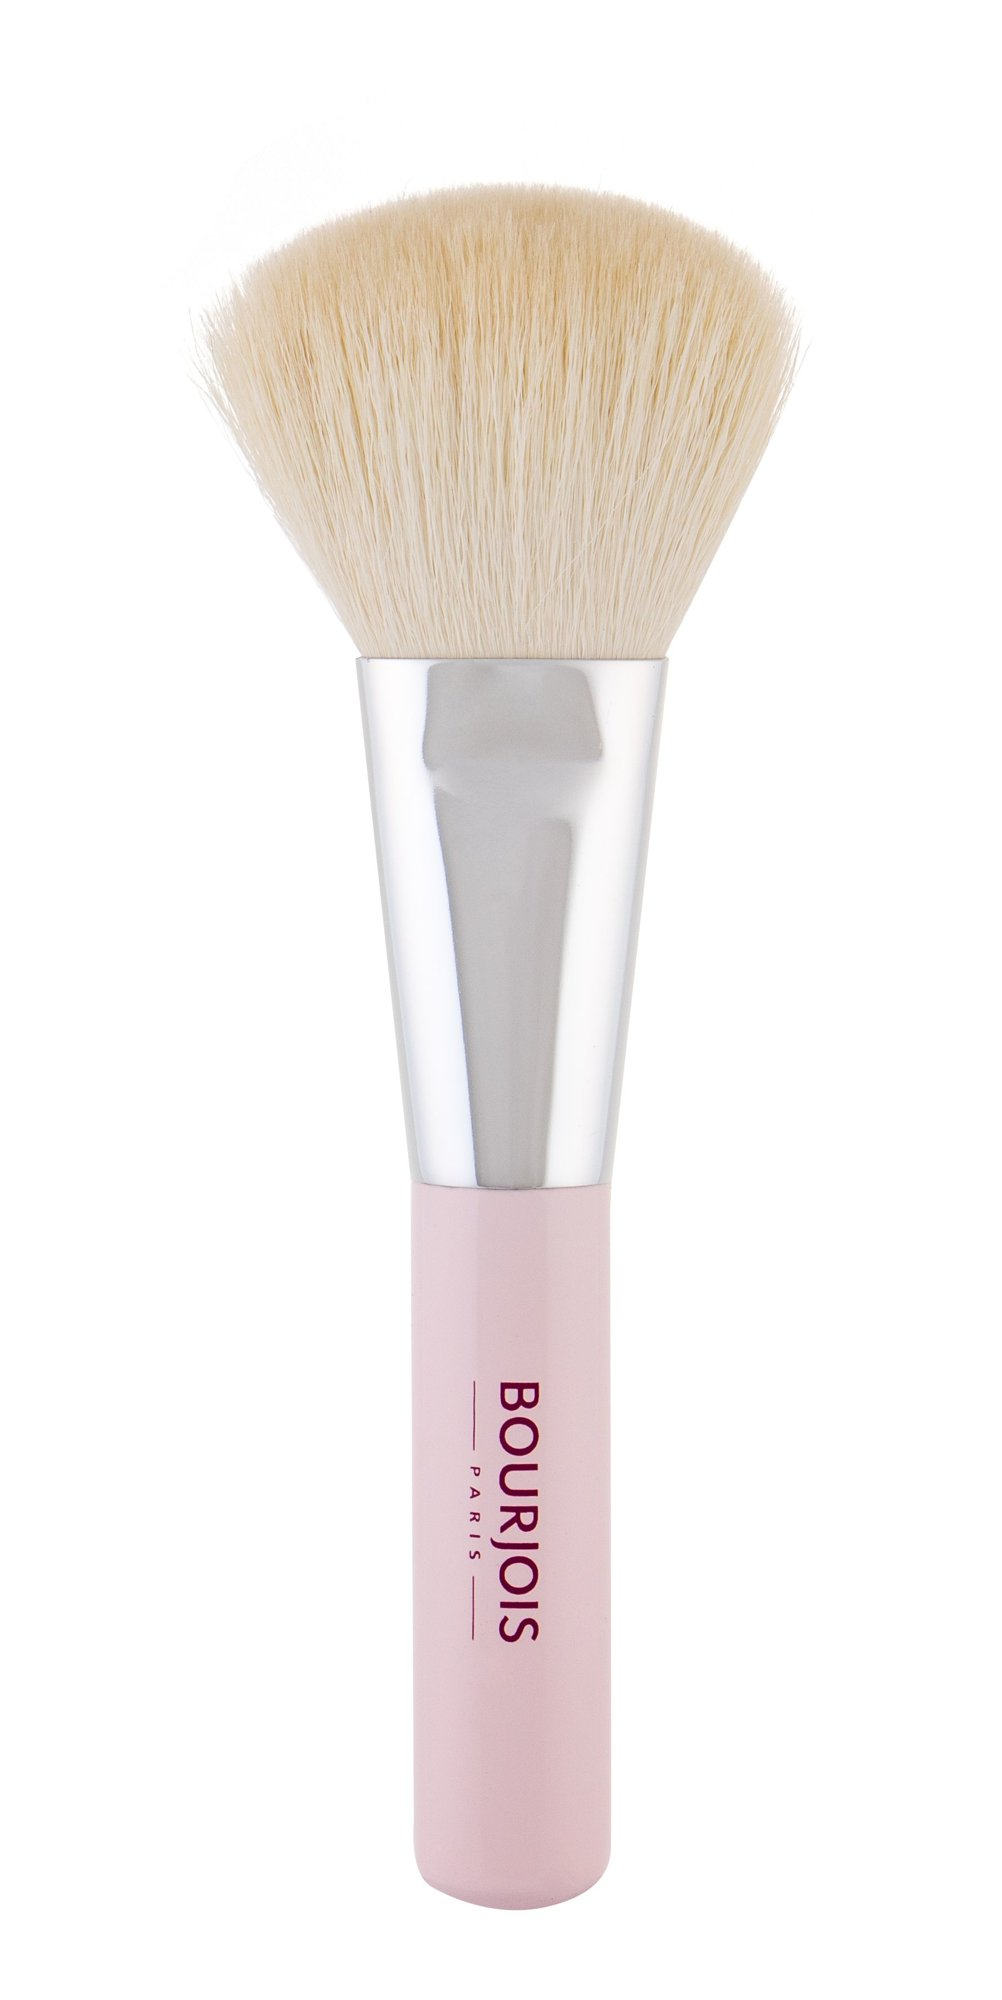 BOURJOIS Paris Brushes Brush 1ml